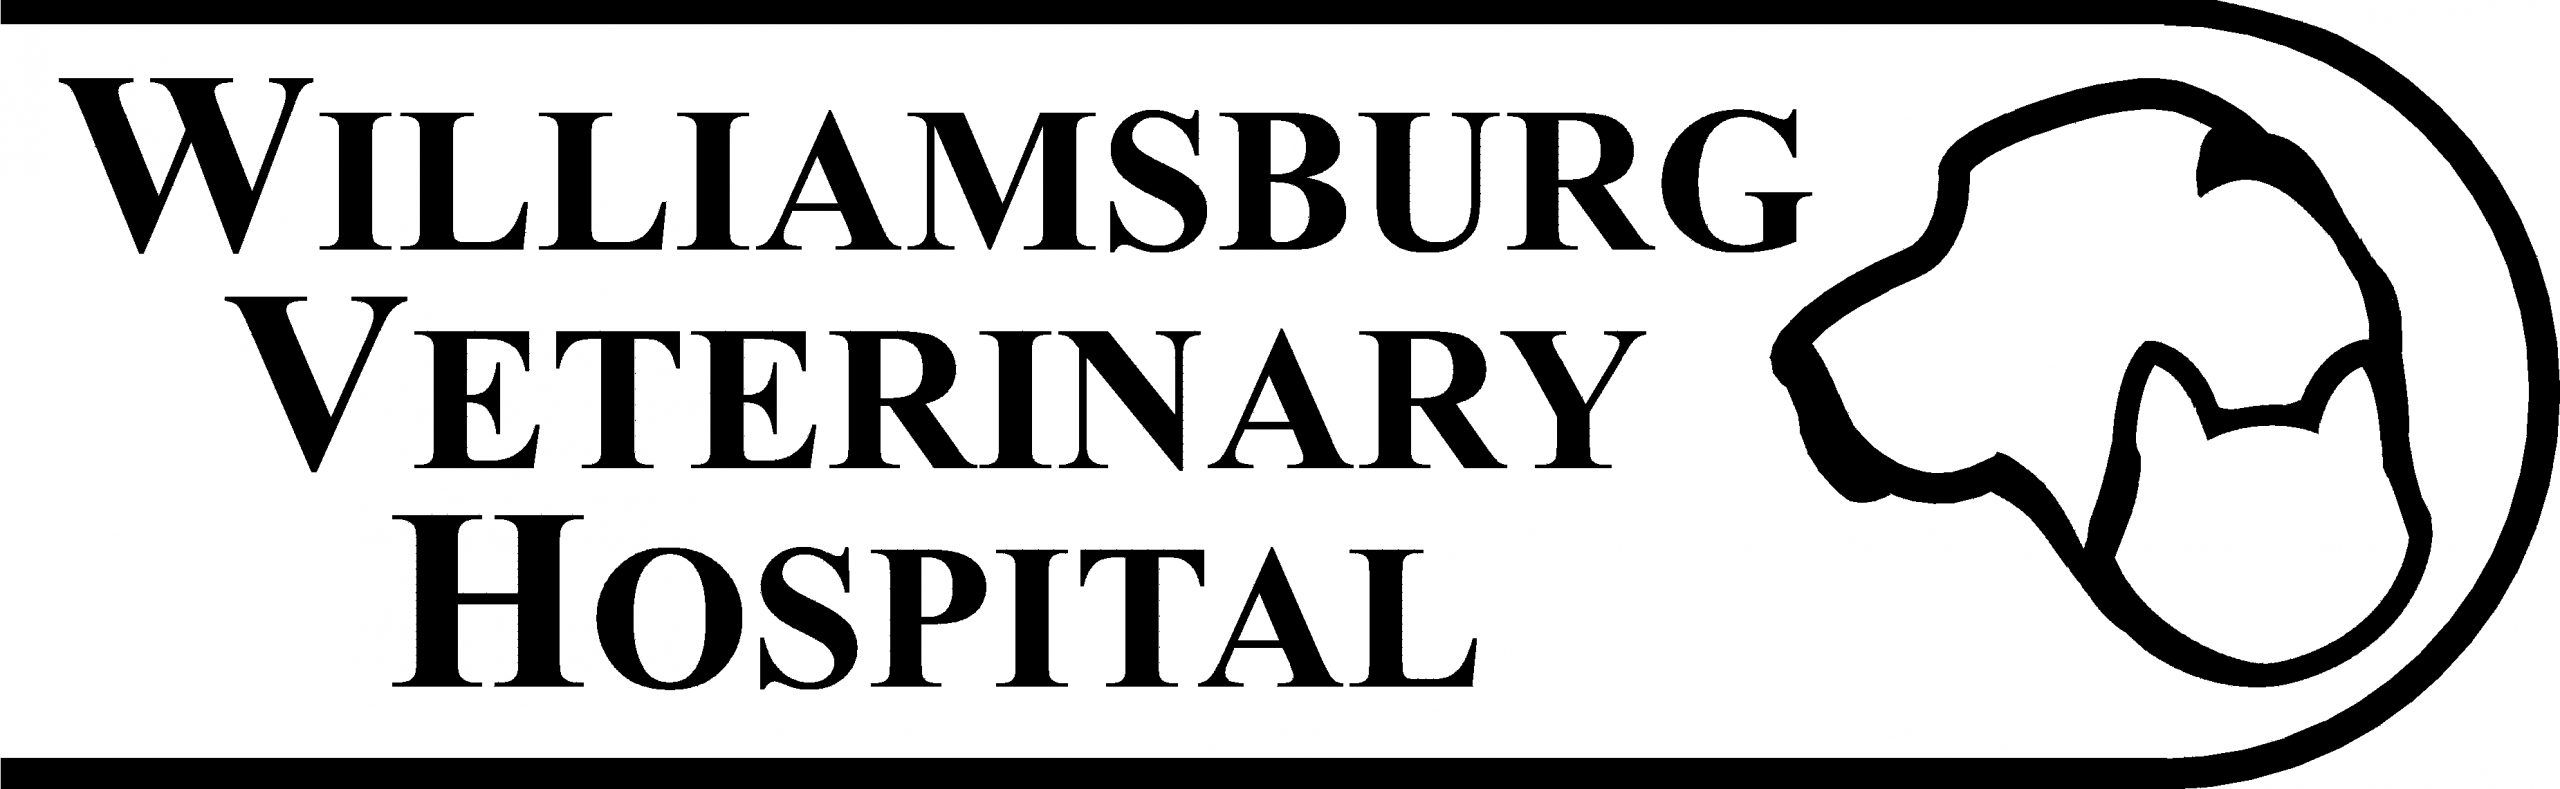 Williamsburg Veterinary Hospital